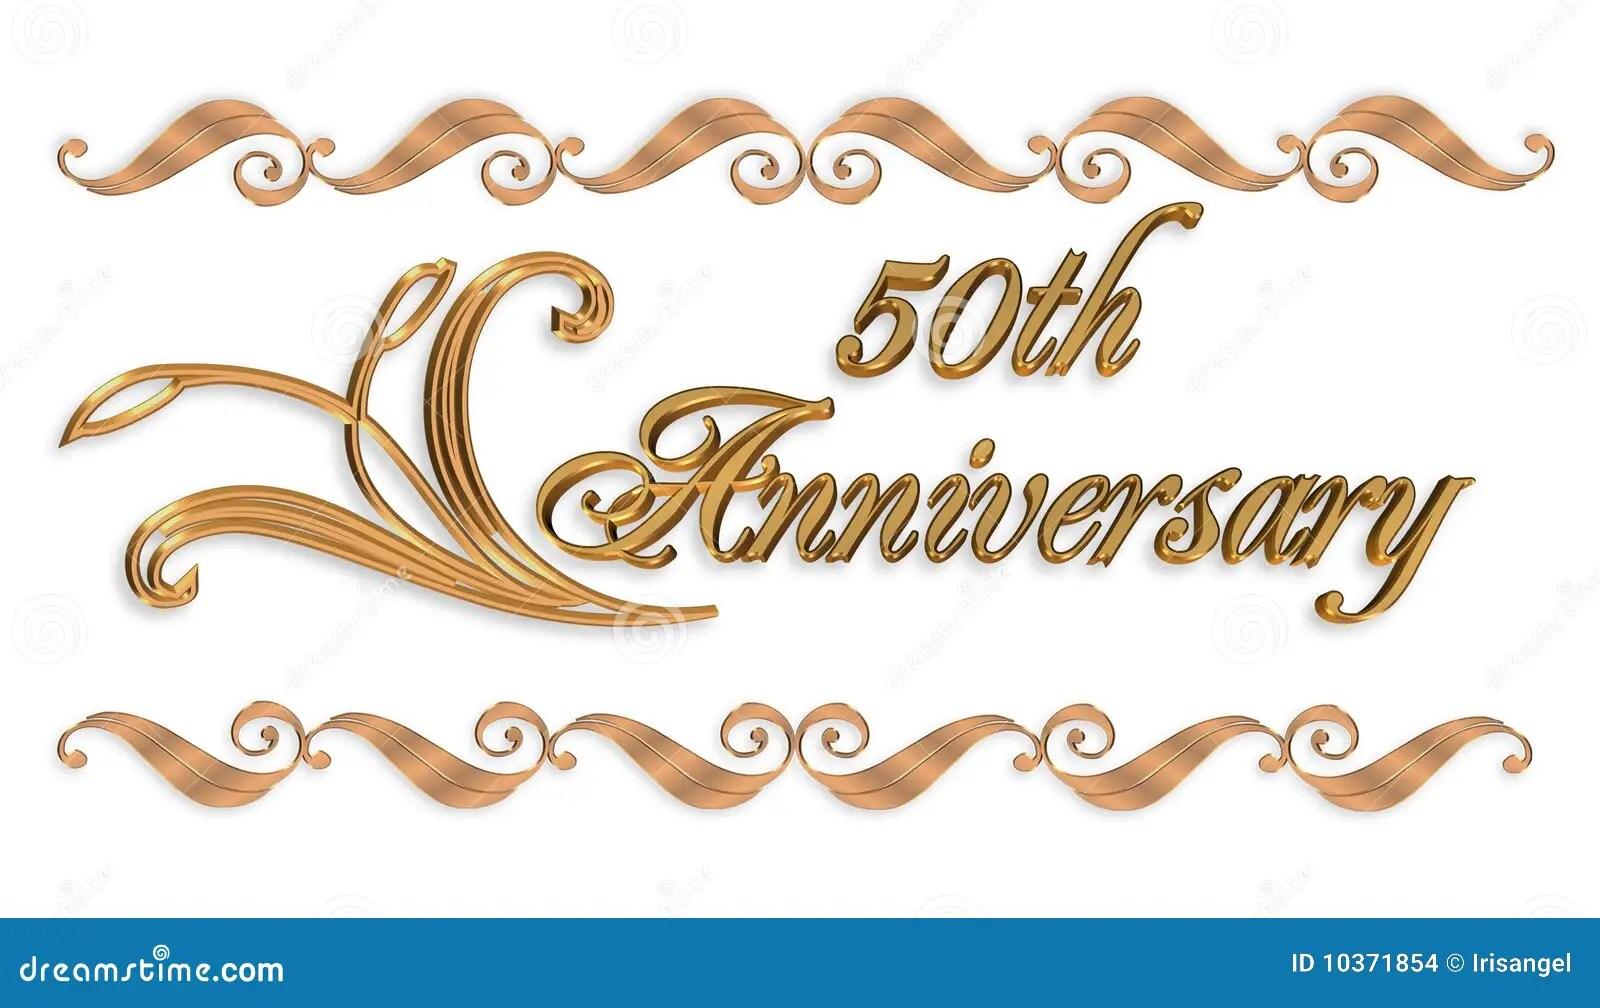 50th wedding anniversary border 50th wedding anniversary 50Th anniversary invitation Stock Images